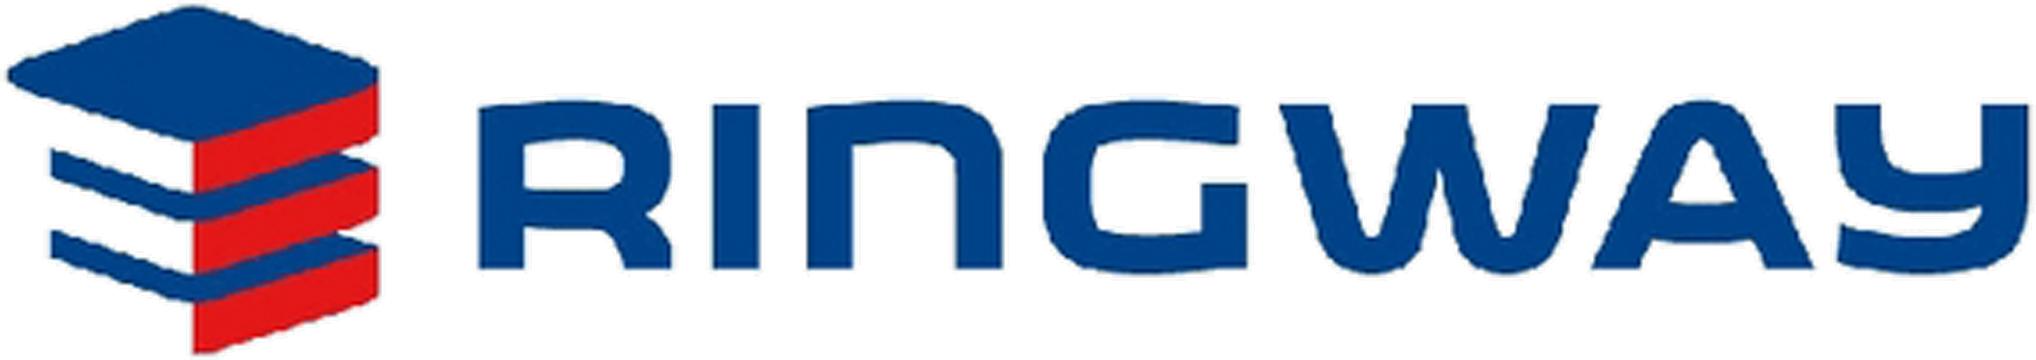 Ringway services logo